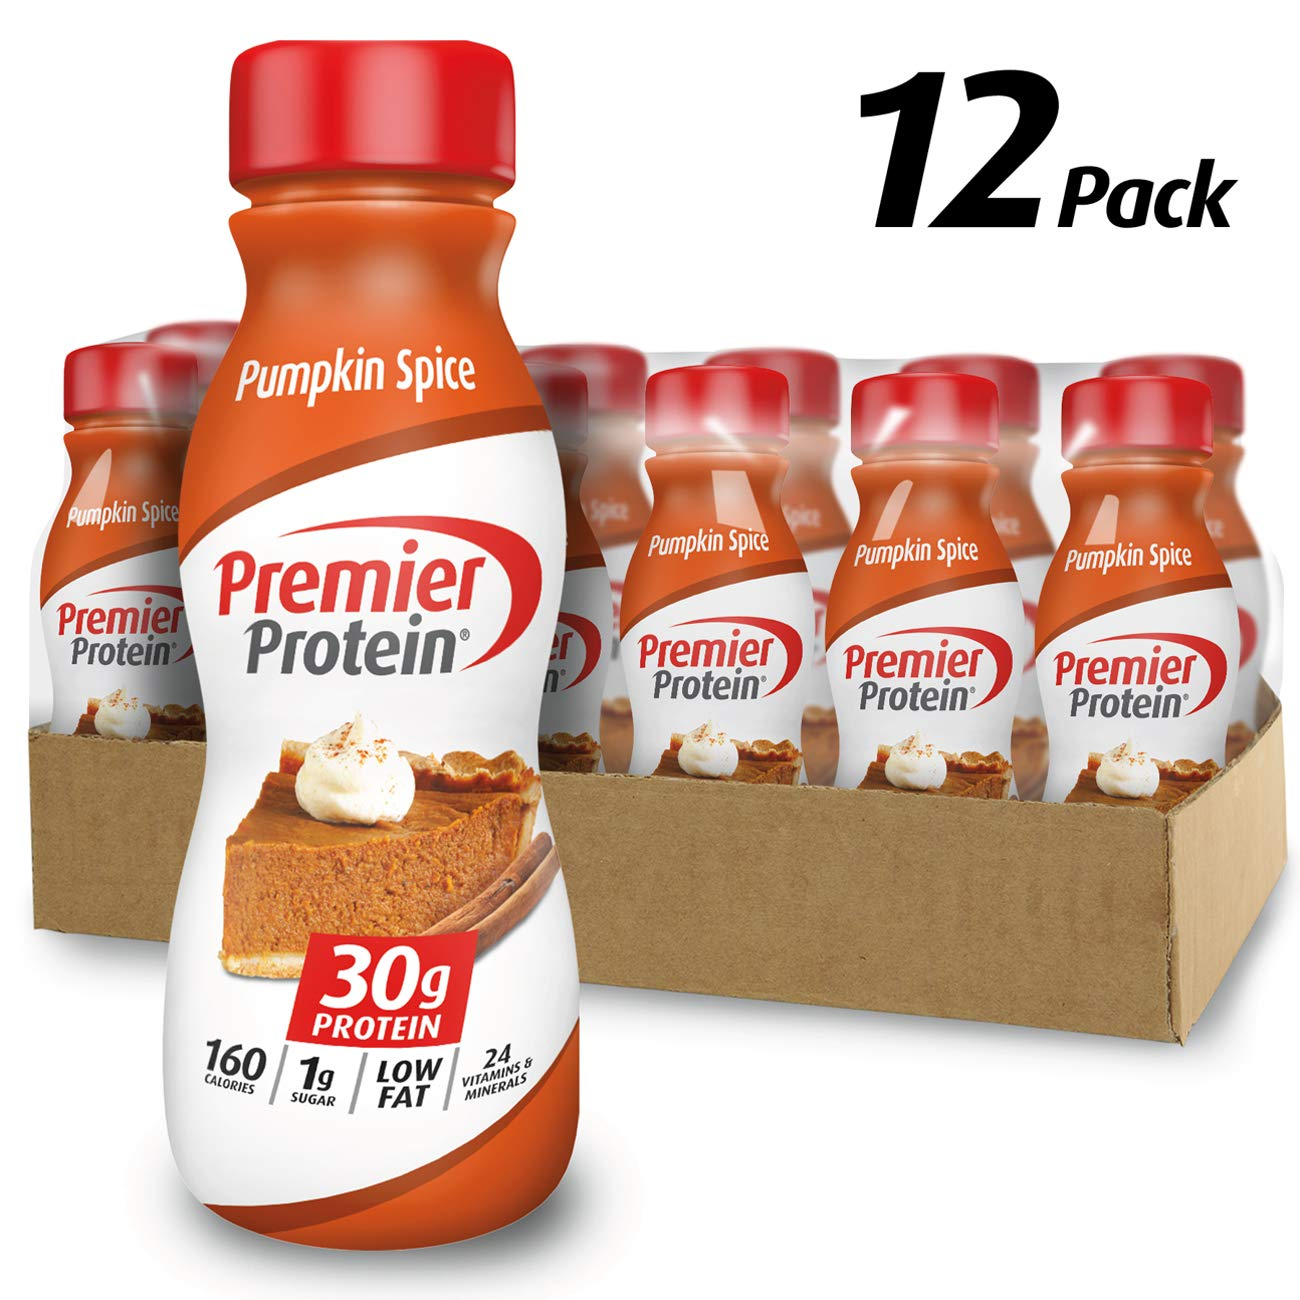 Premier Protein 30g Protein Shake, Limited Edition Pumpkin Spice, 11.5 Fl. Oz, 12Count by Premier Protein